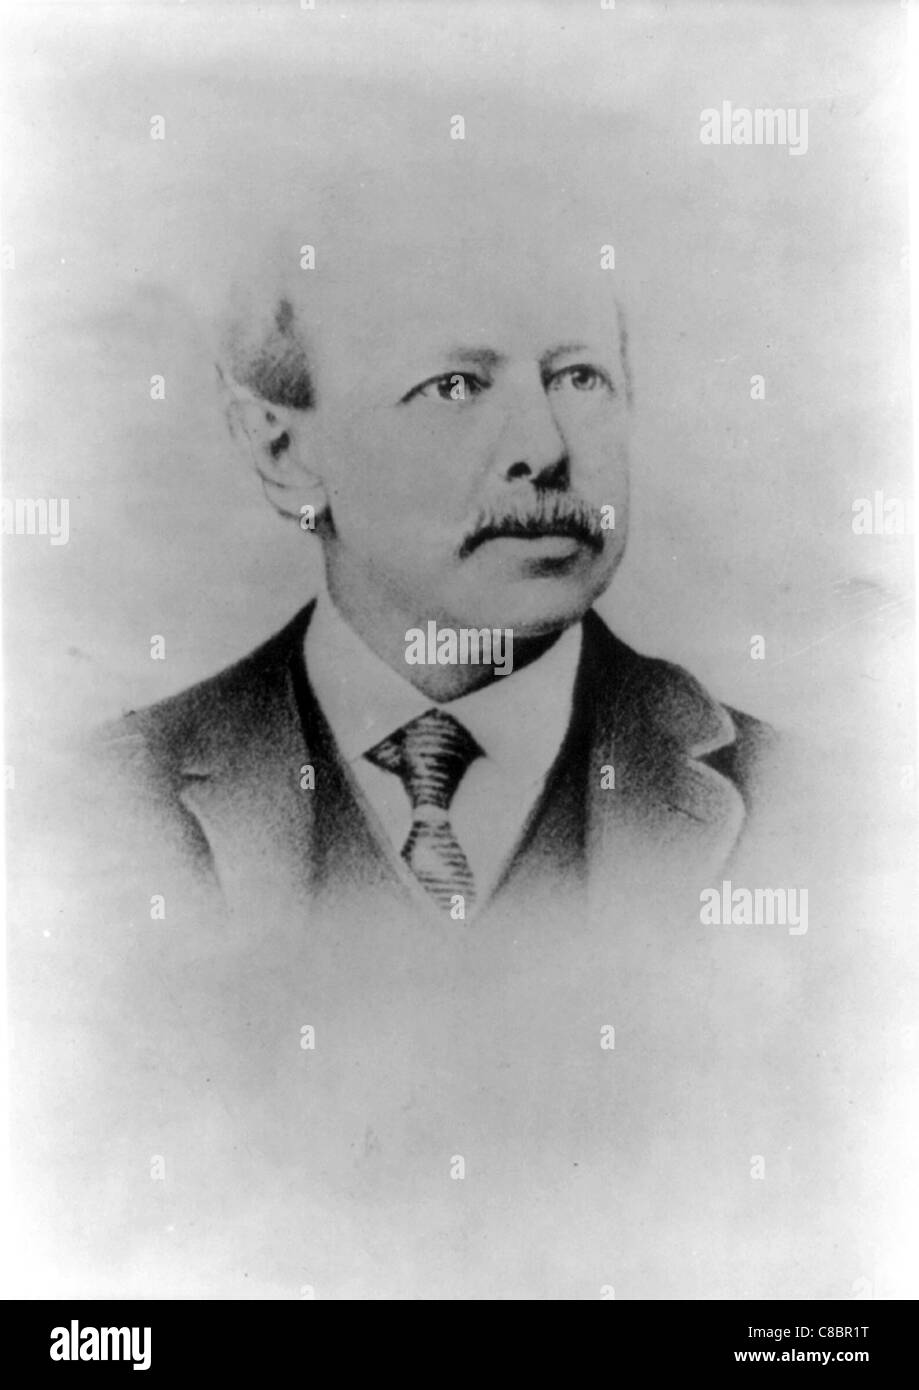 Horatio Alger, Jr. aus dem 19. Jahrhundert amerikanischer Autor Stockfoto